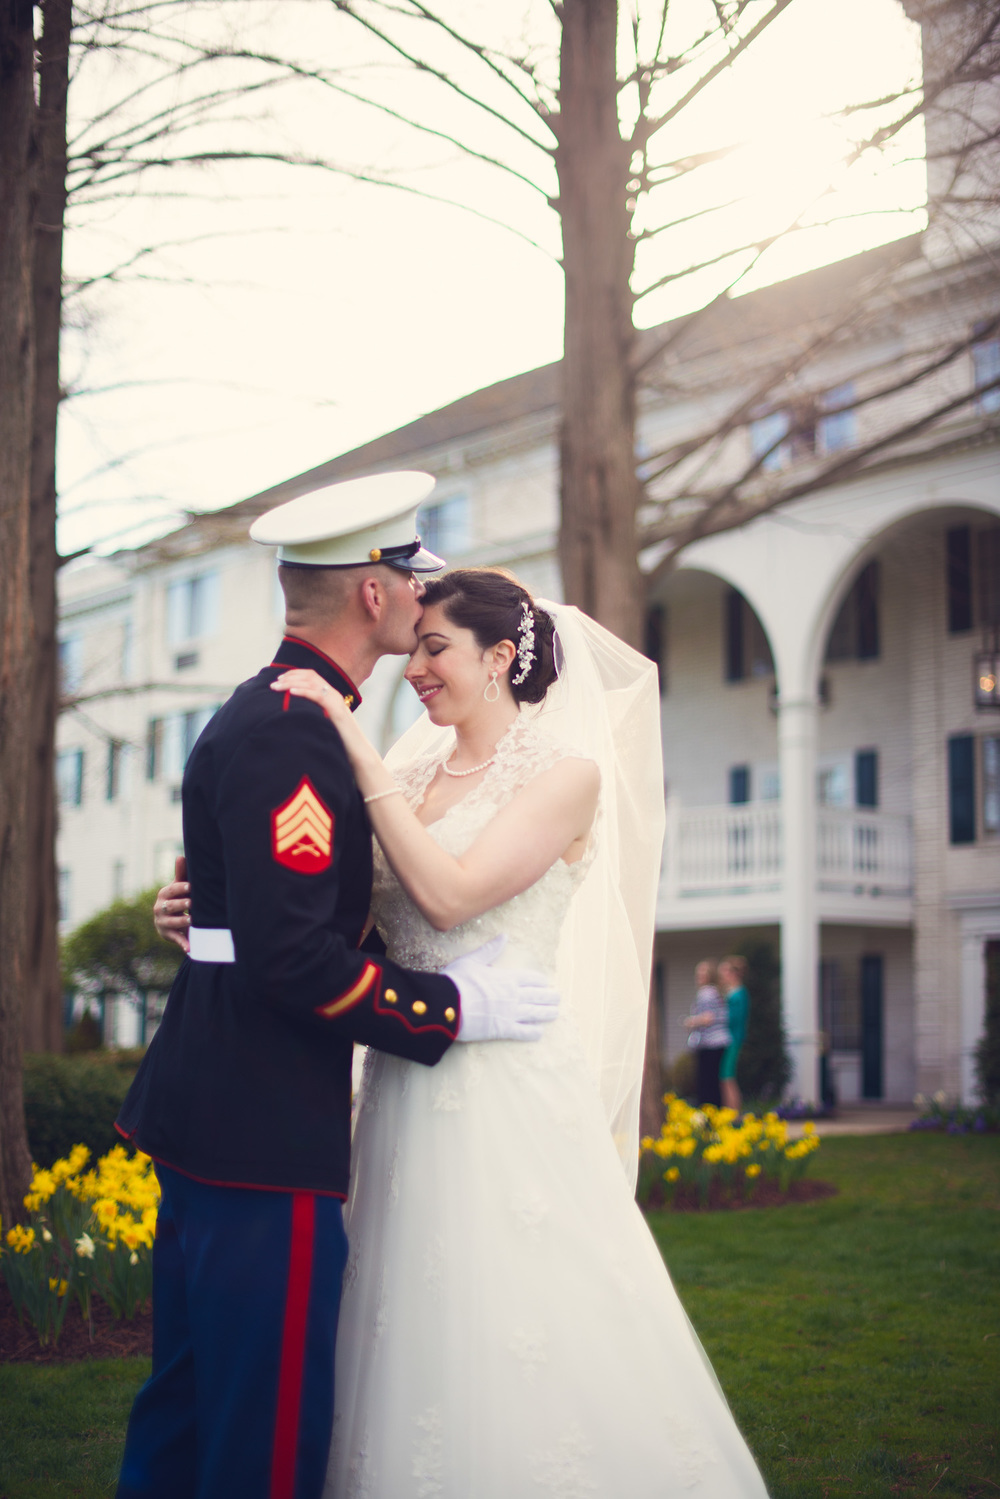 bride groom marine outdoor love husband wife portrait THPHOTO